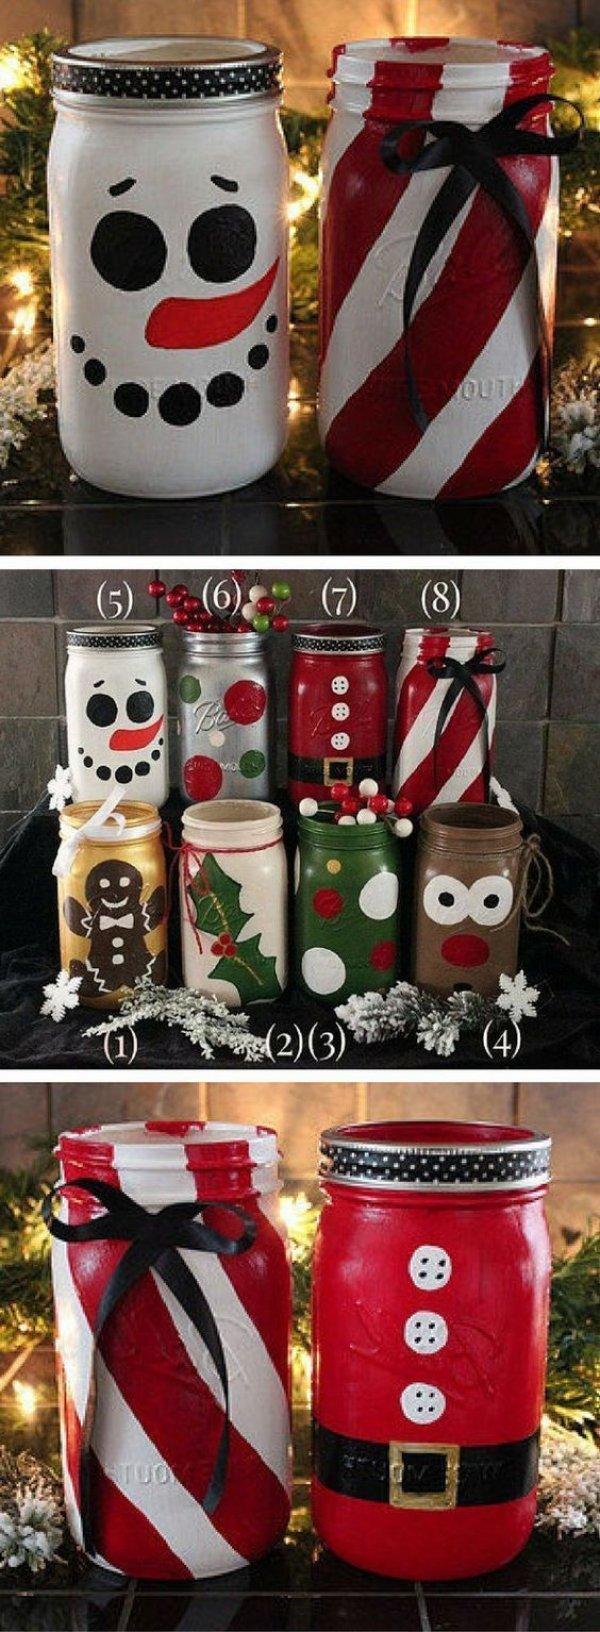 Chic snowman mason jar craft for Christmas.